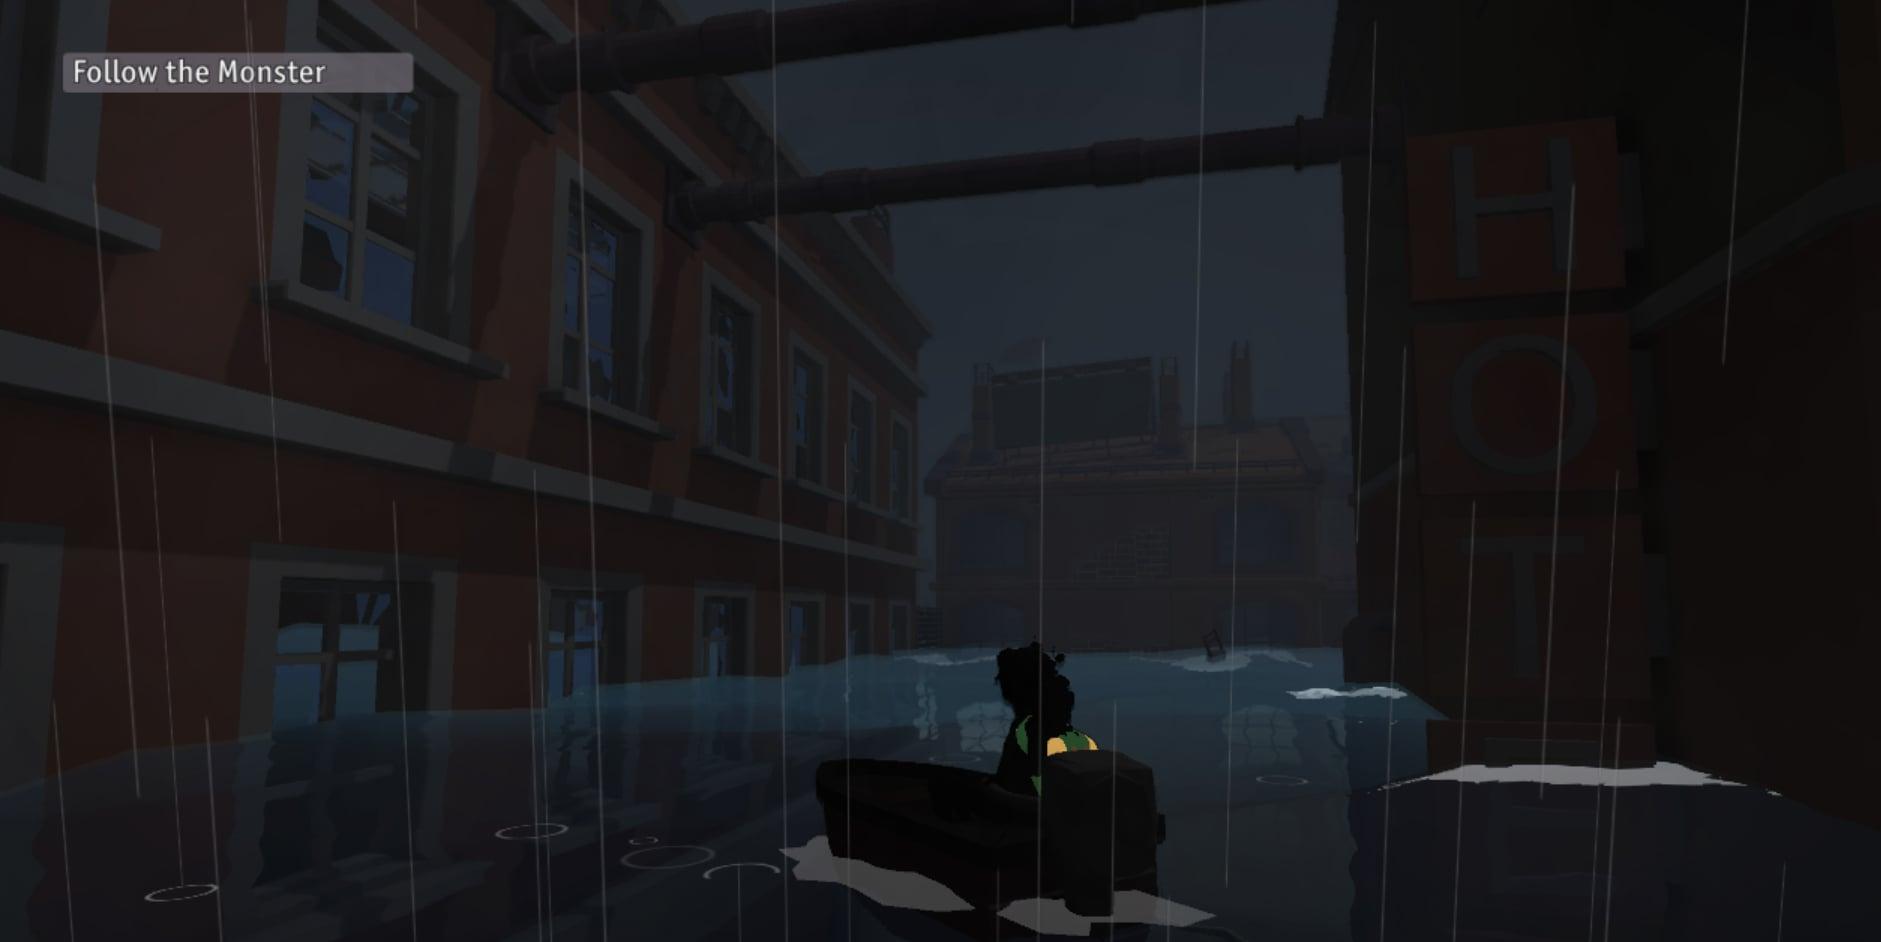 sea_of_solitude_jo-mei_games_screenshot_9.jpg